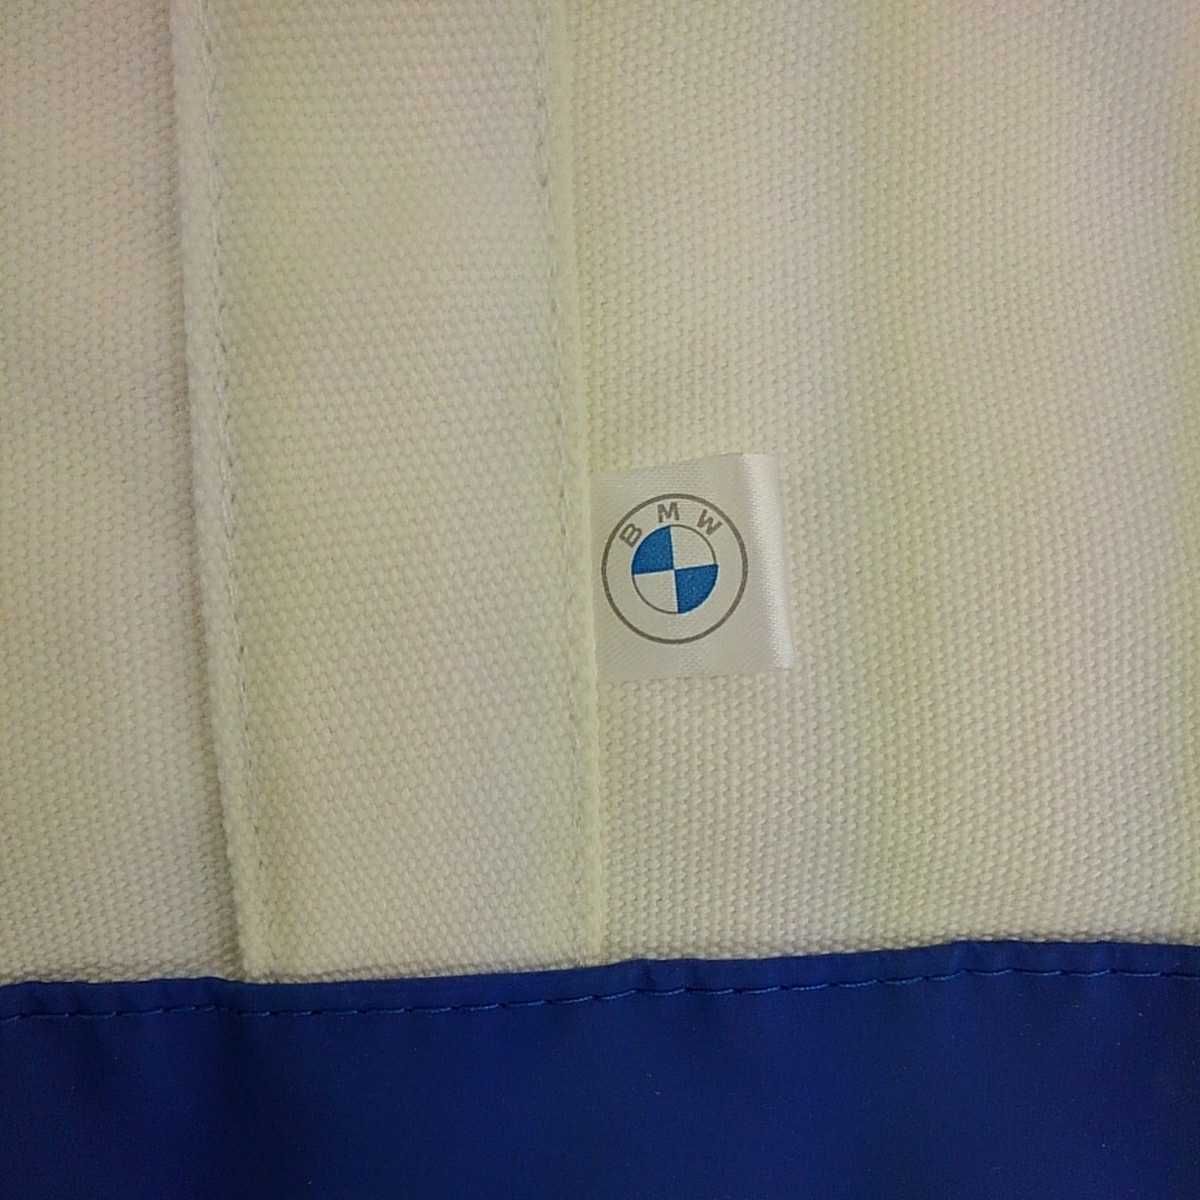 ◇BMW ノベルティートートバッグ 白×青 非売品 未使用◇_画像2